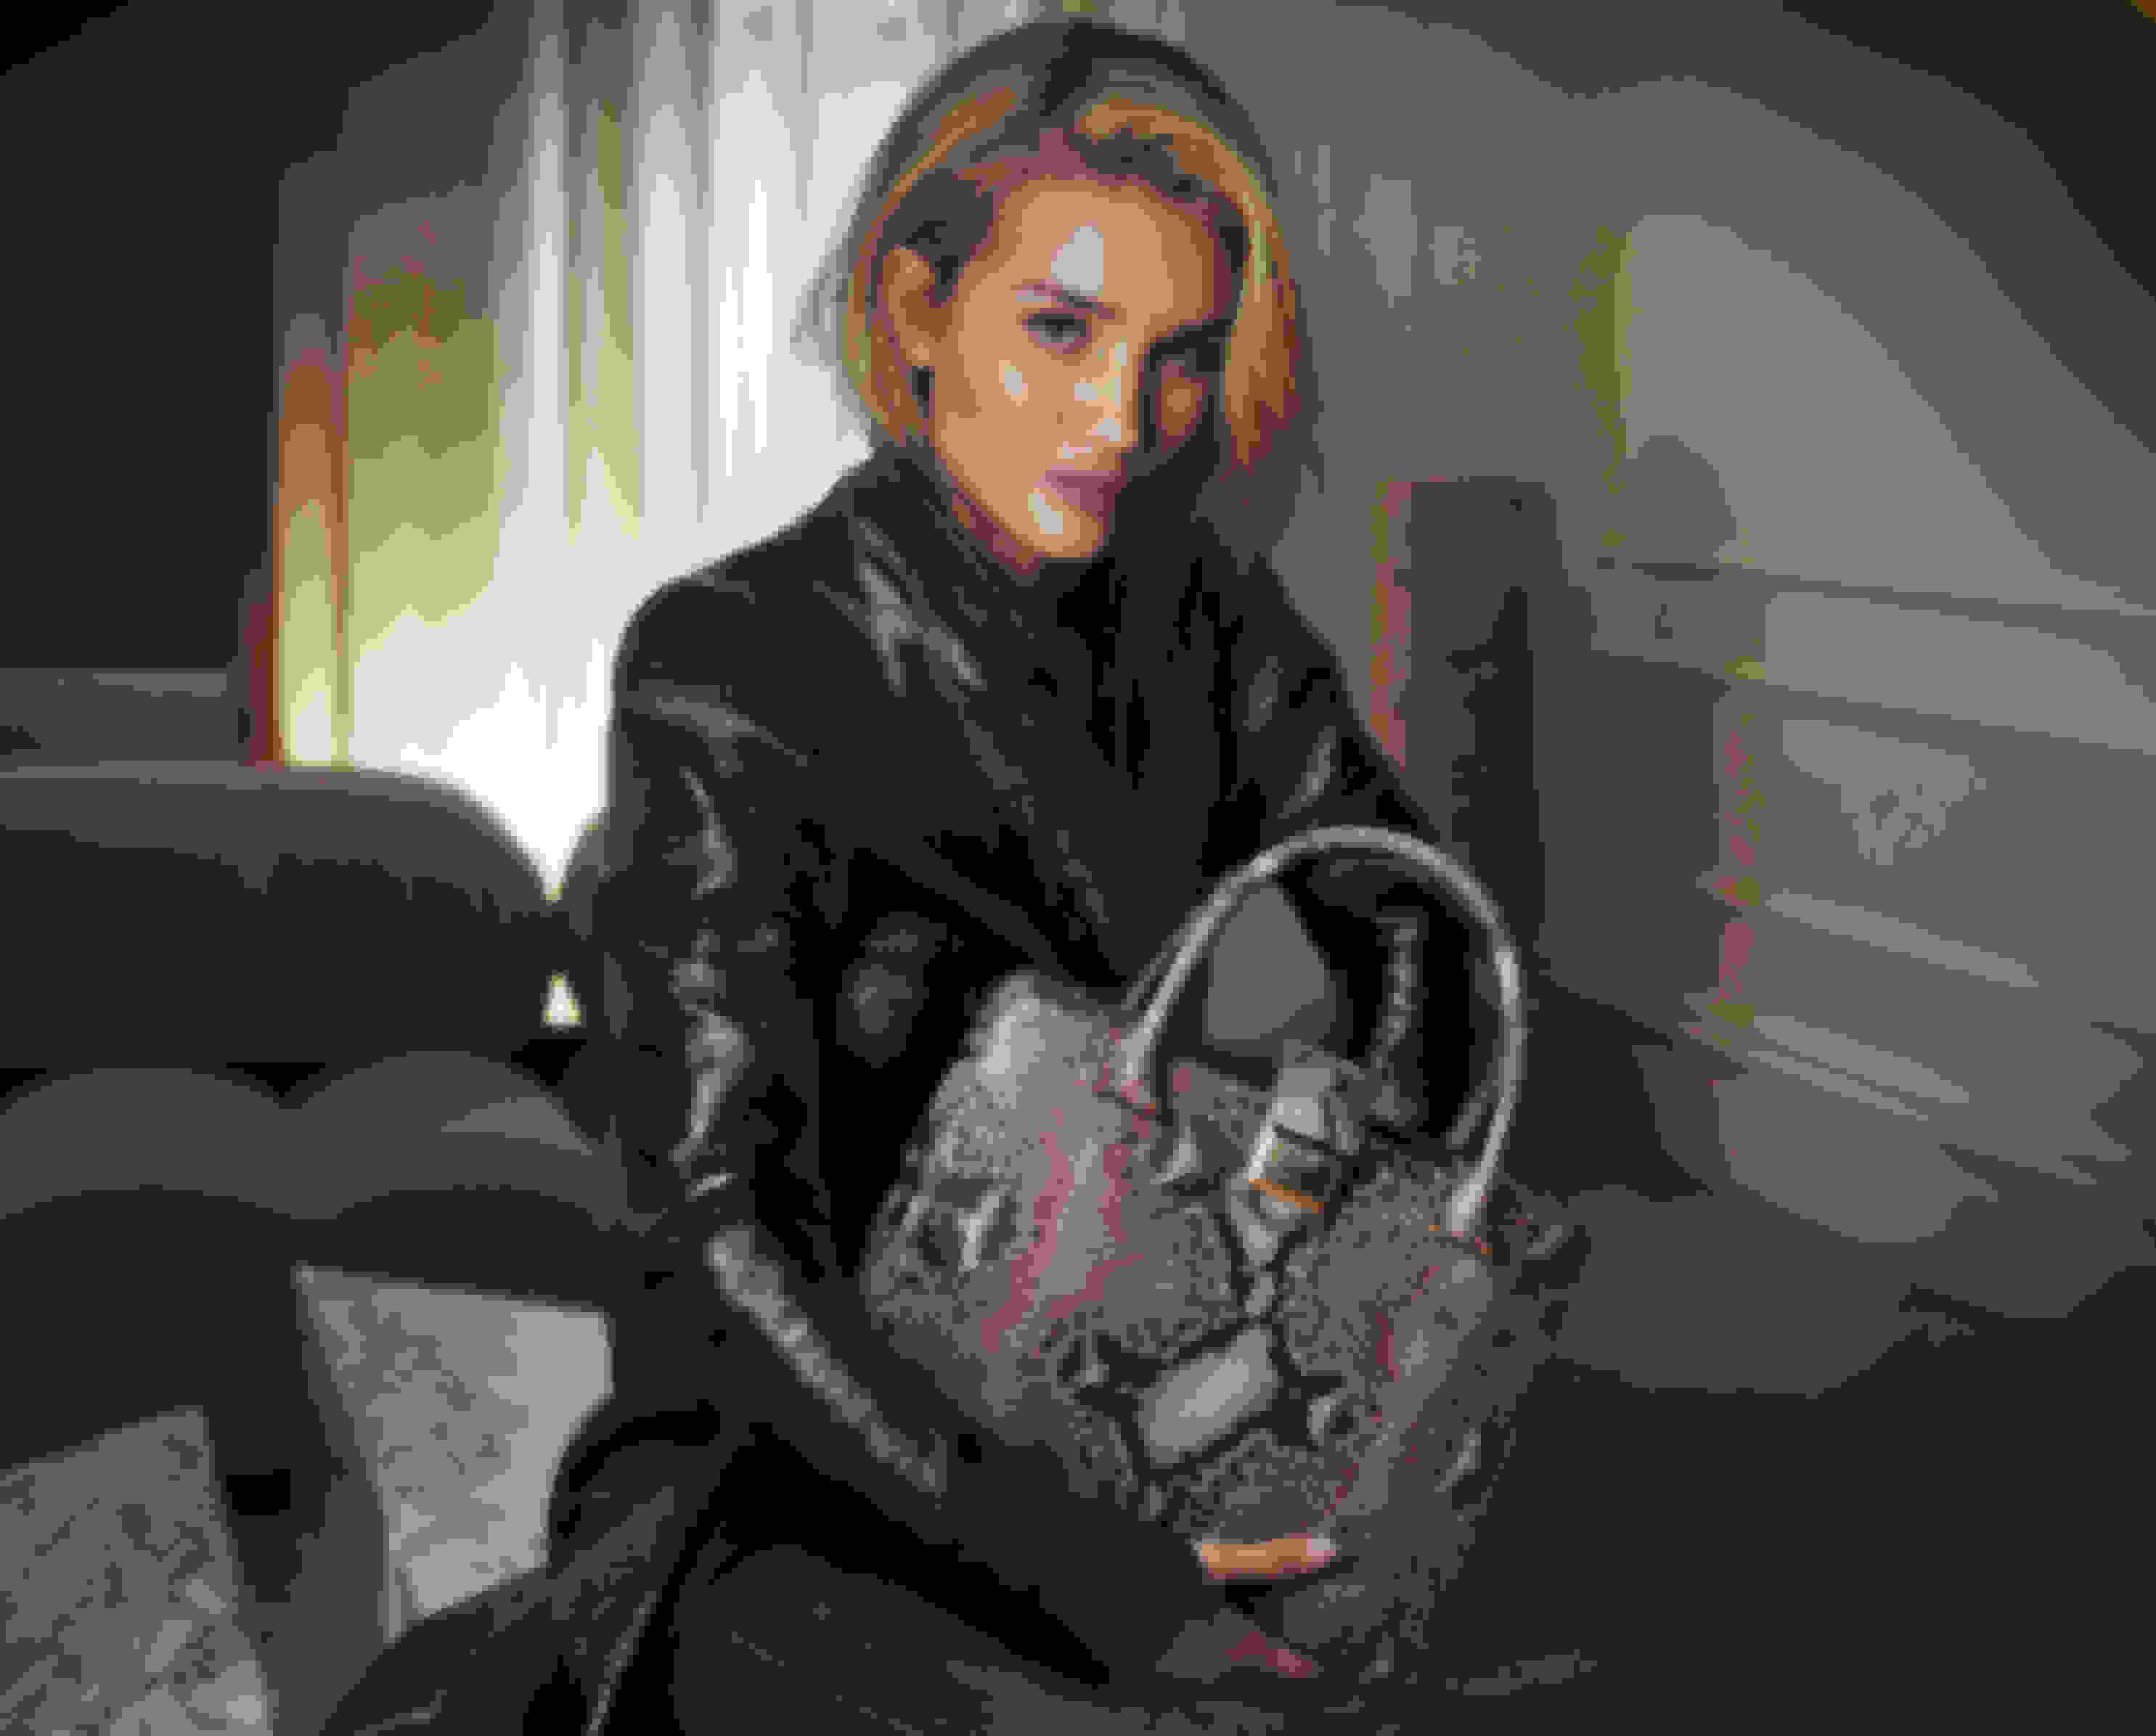 Rosie Huntington-Whiteley wearing MARIANNE